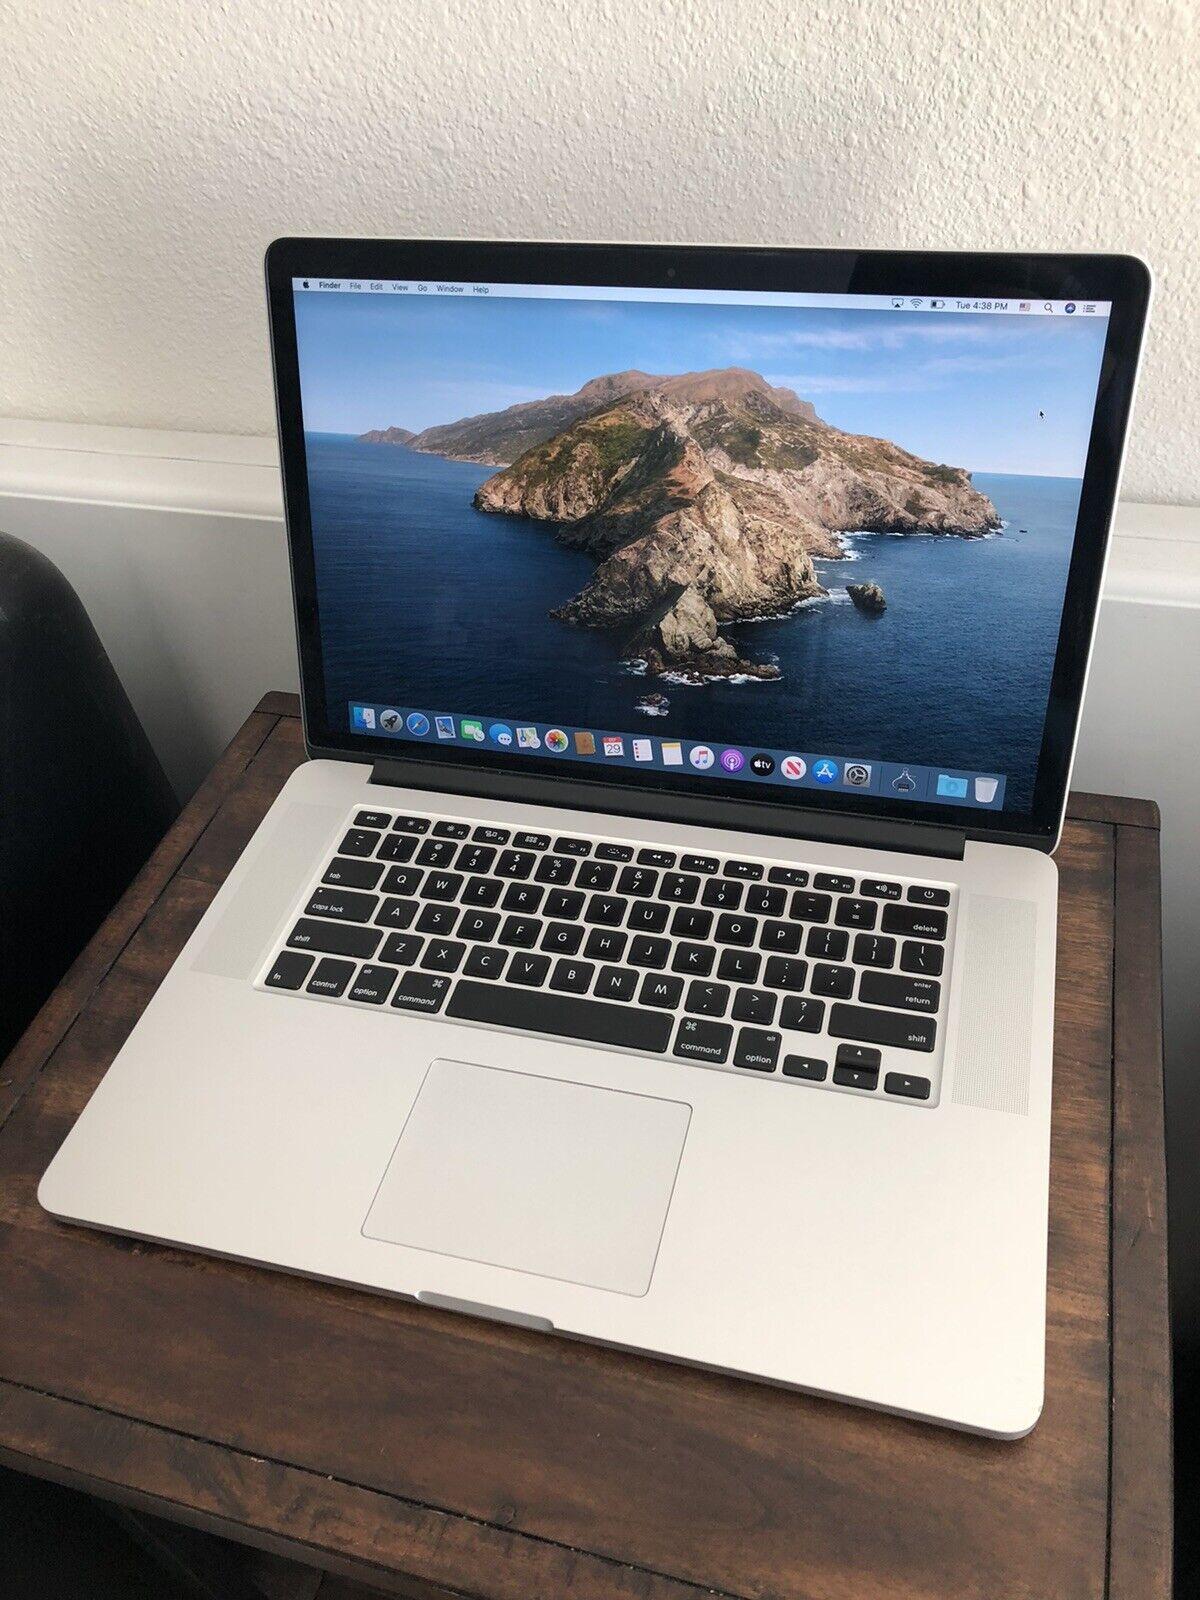 Apple MacBook Pro Retina 15-inch Mid-2015 16GB 512GB SSD 2.8 ghz i7. Buy it now for 899.00